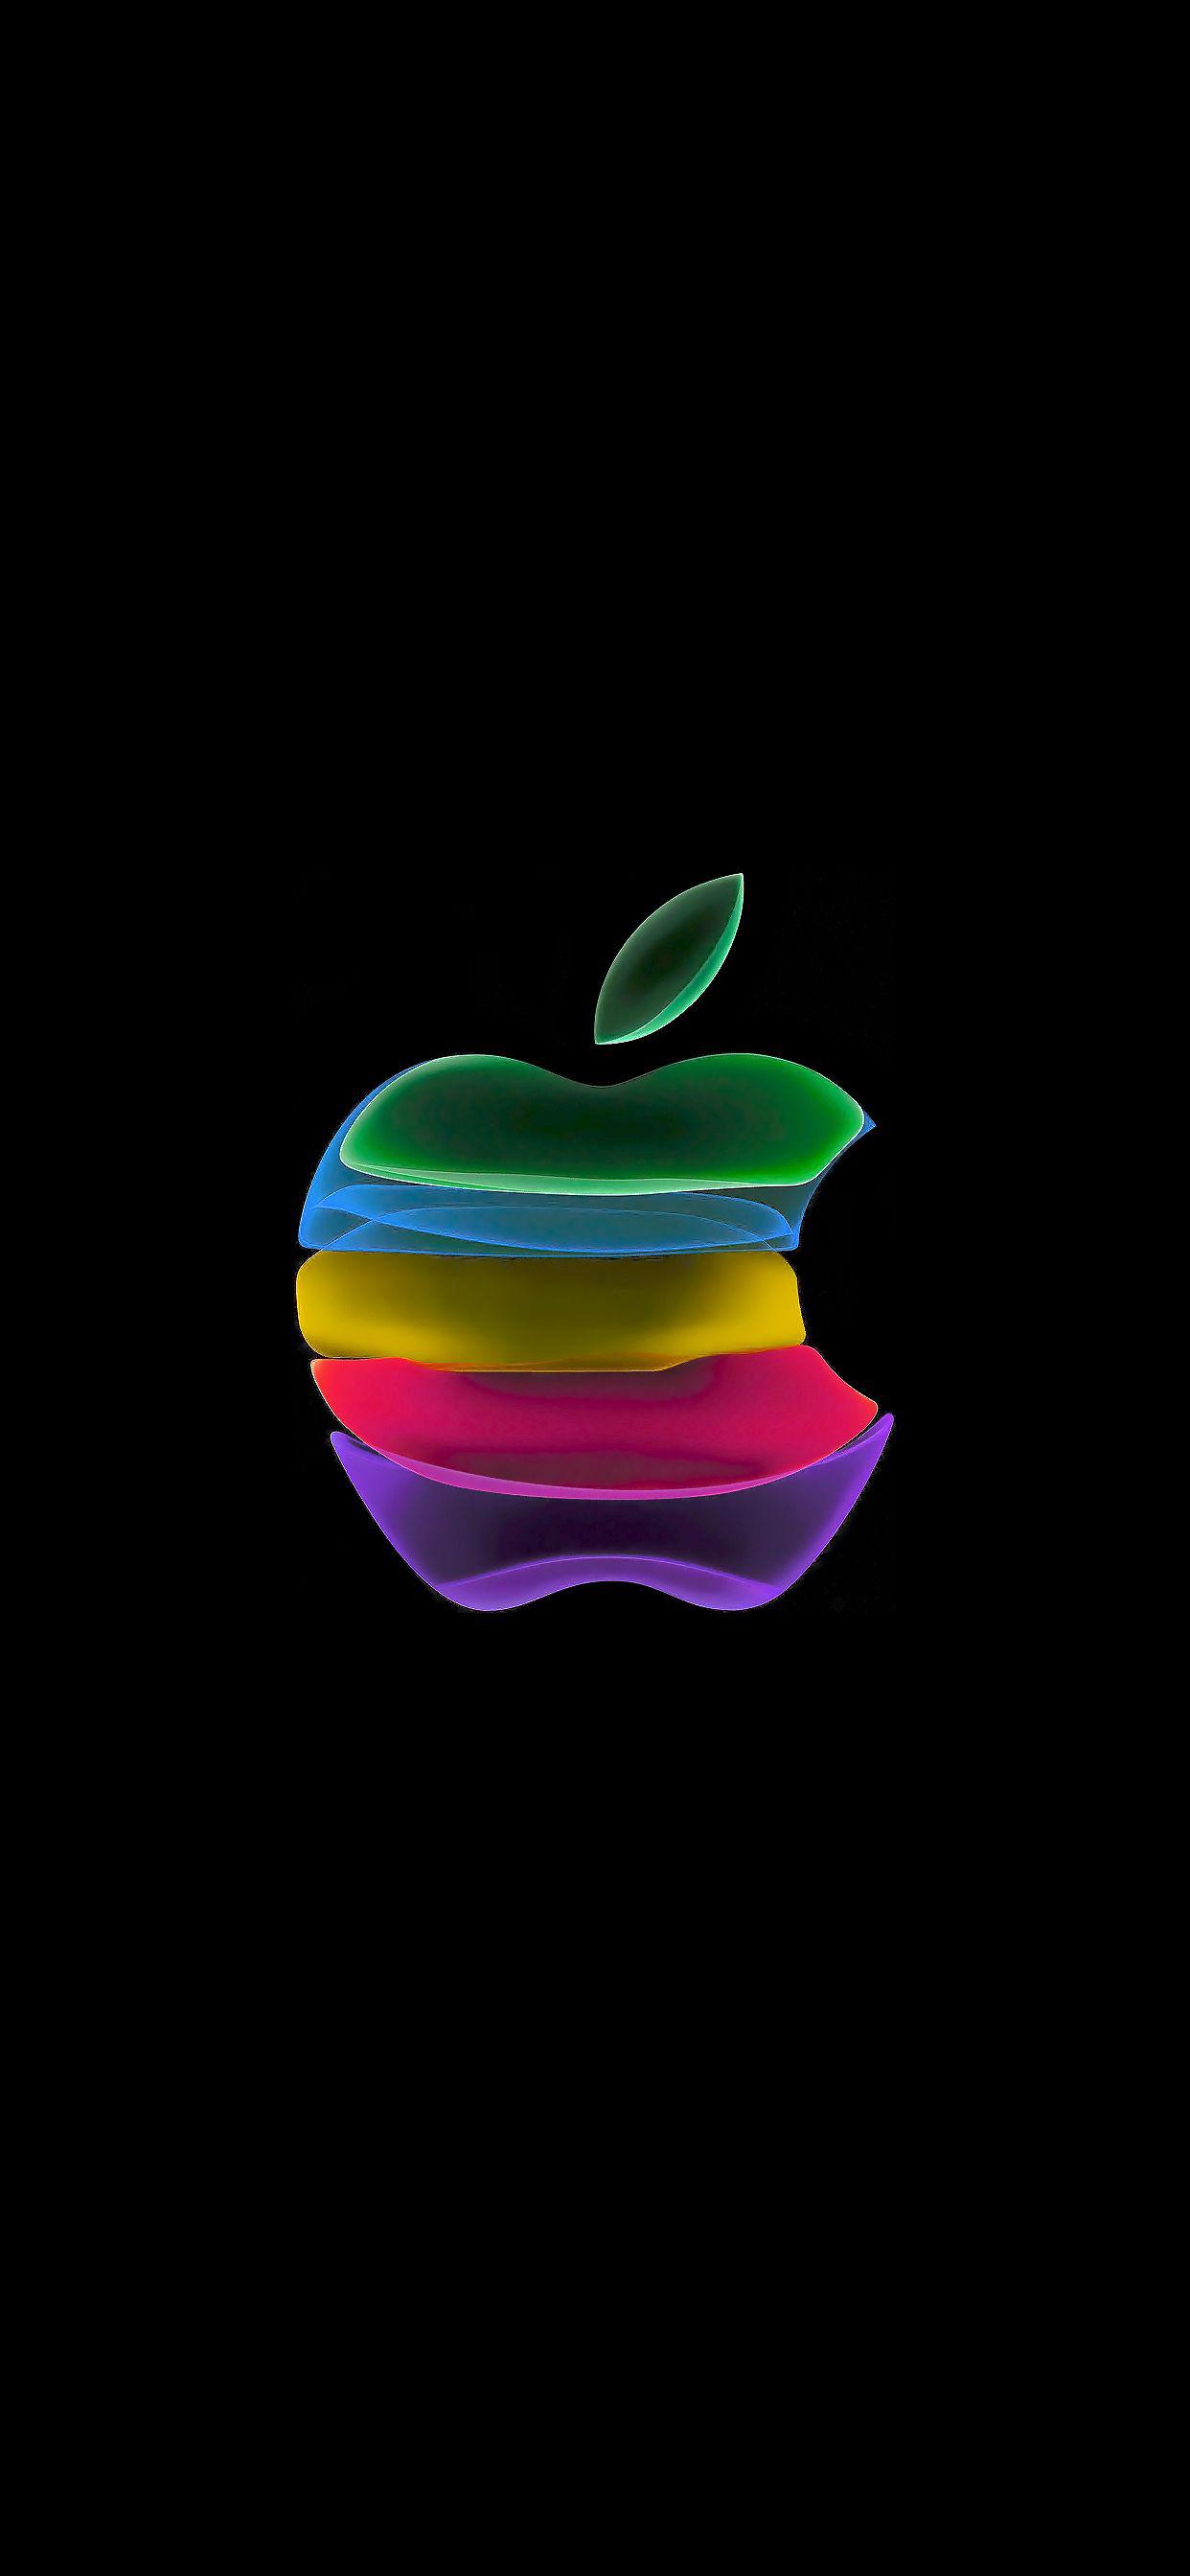 Ios 13 Wallpaper Apple